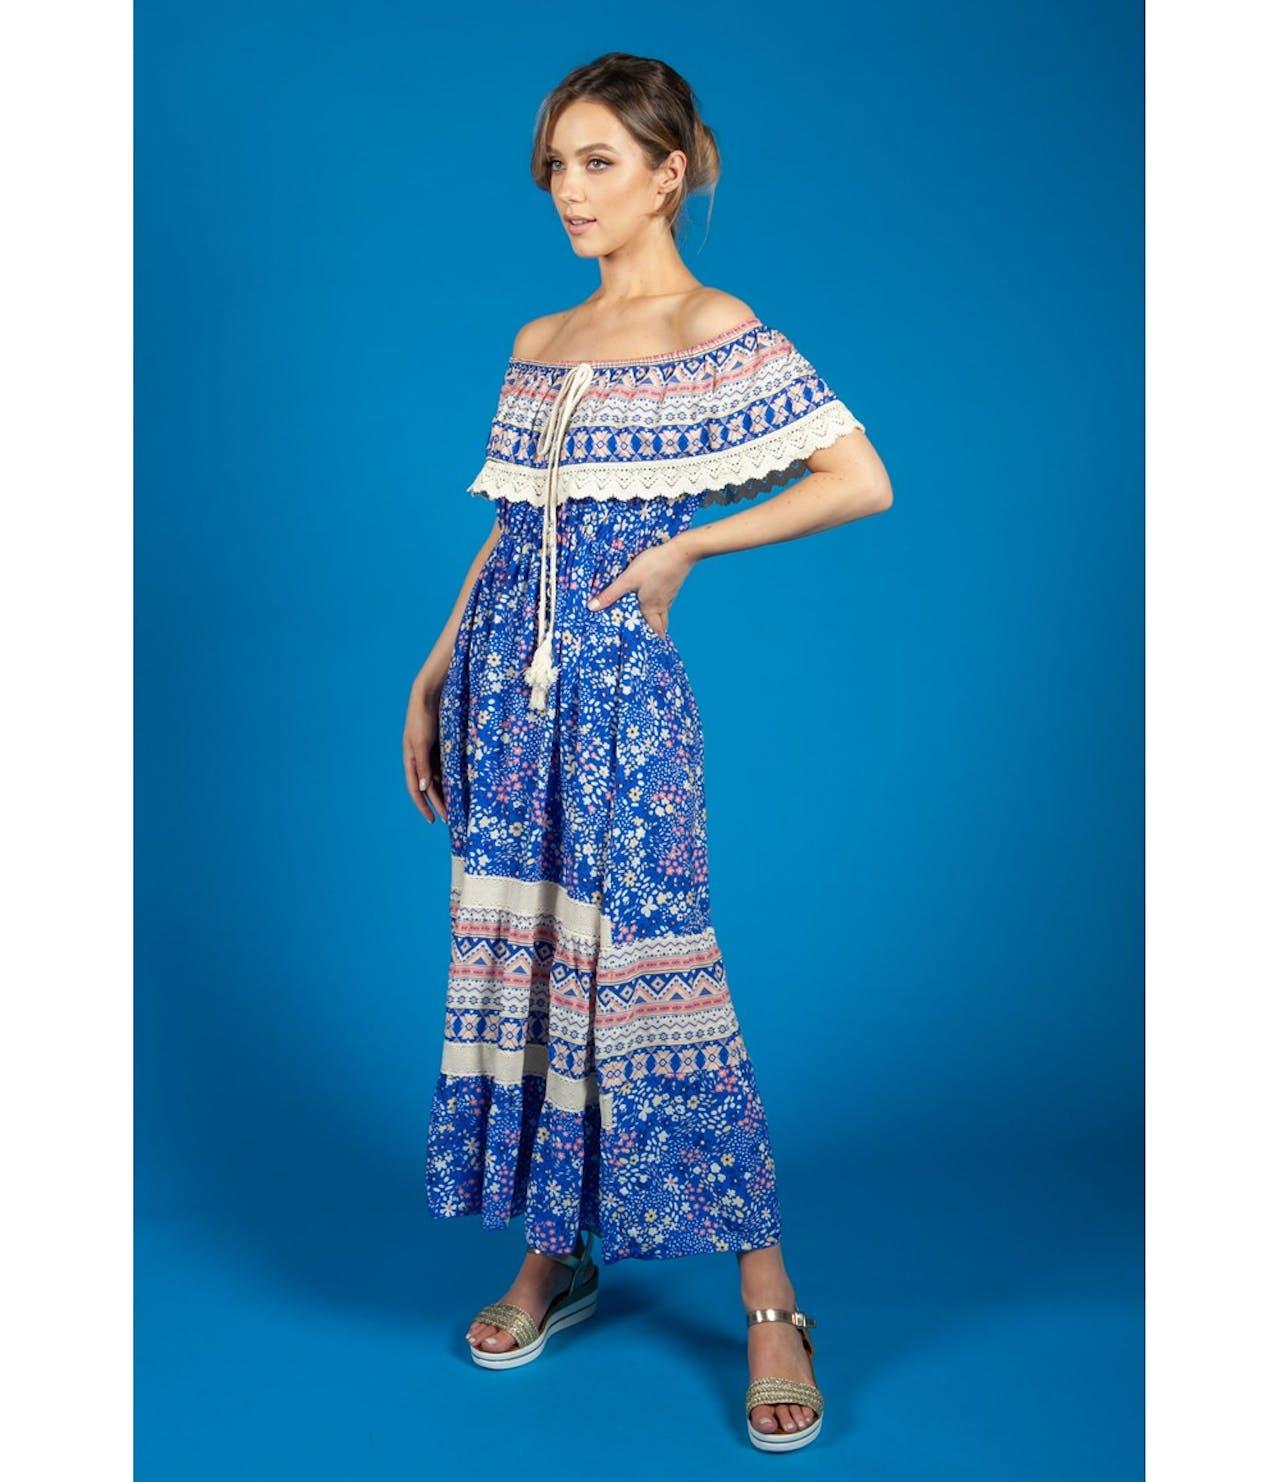 Zapara Bardot Floral Mix Dress in Royal Blue